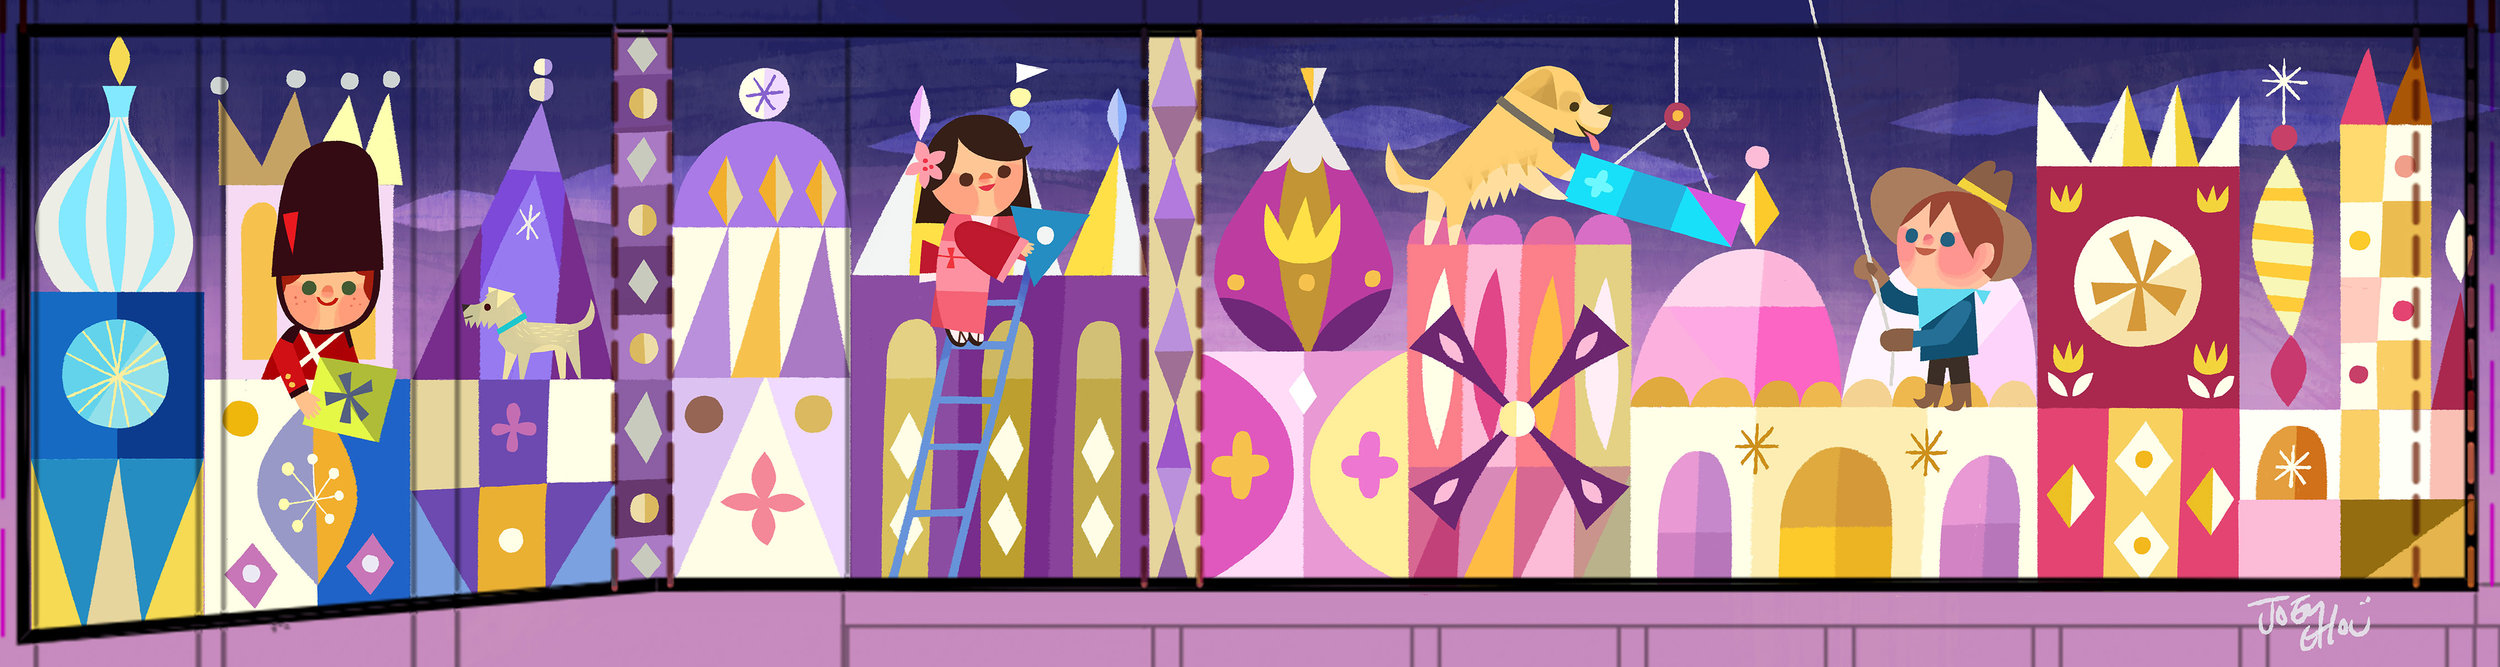 last_mural_color_3_jchou_revised_web.jpg